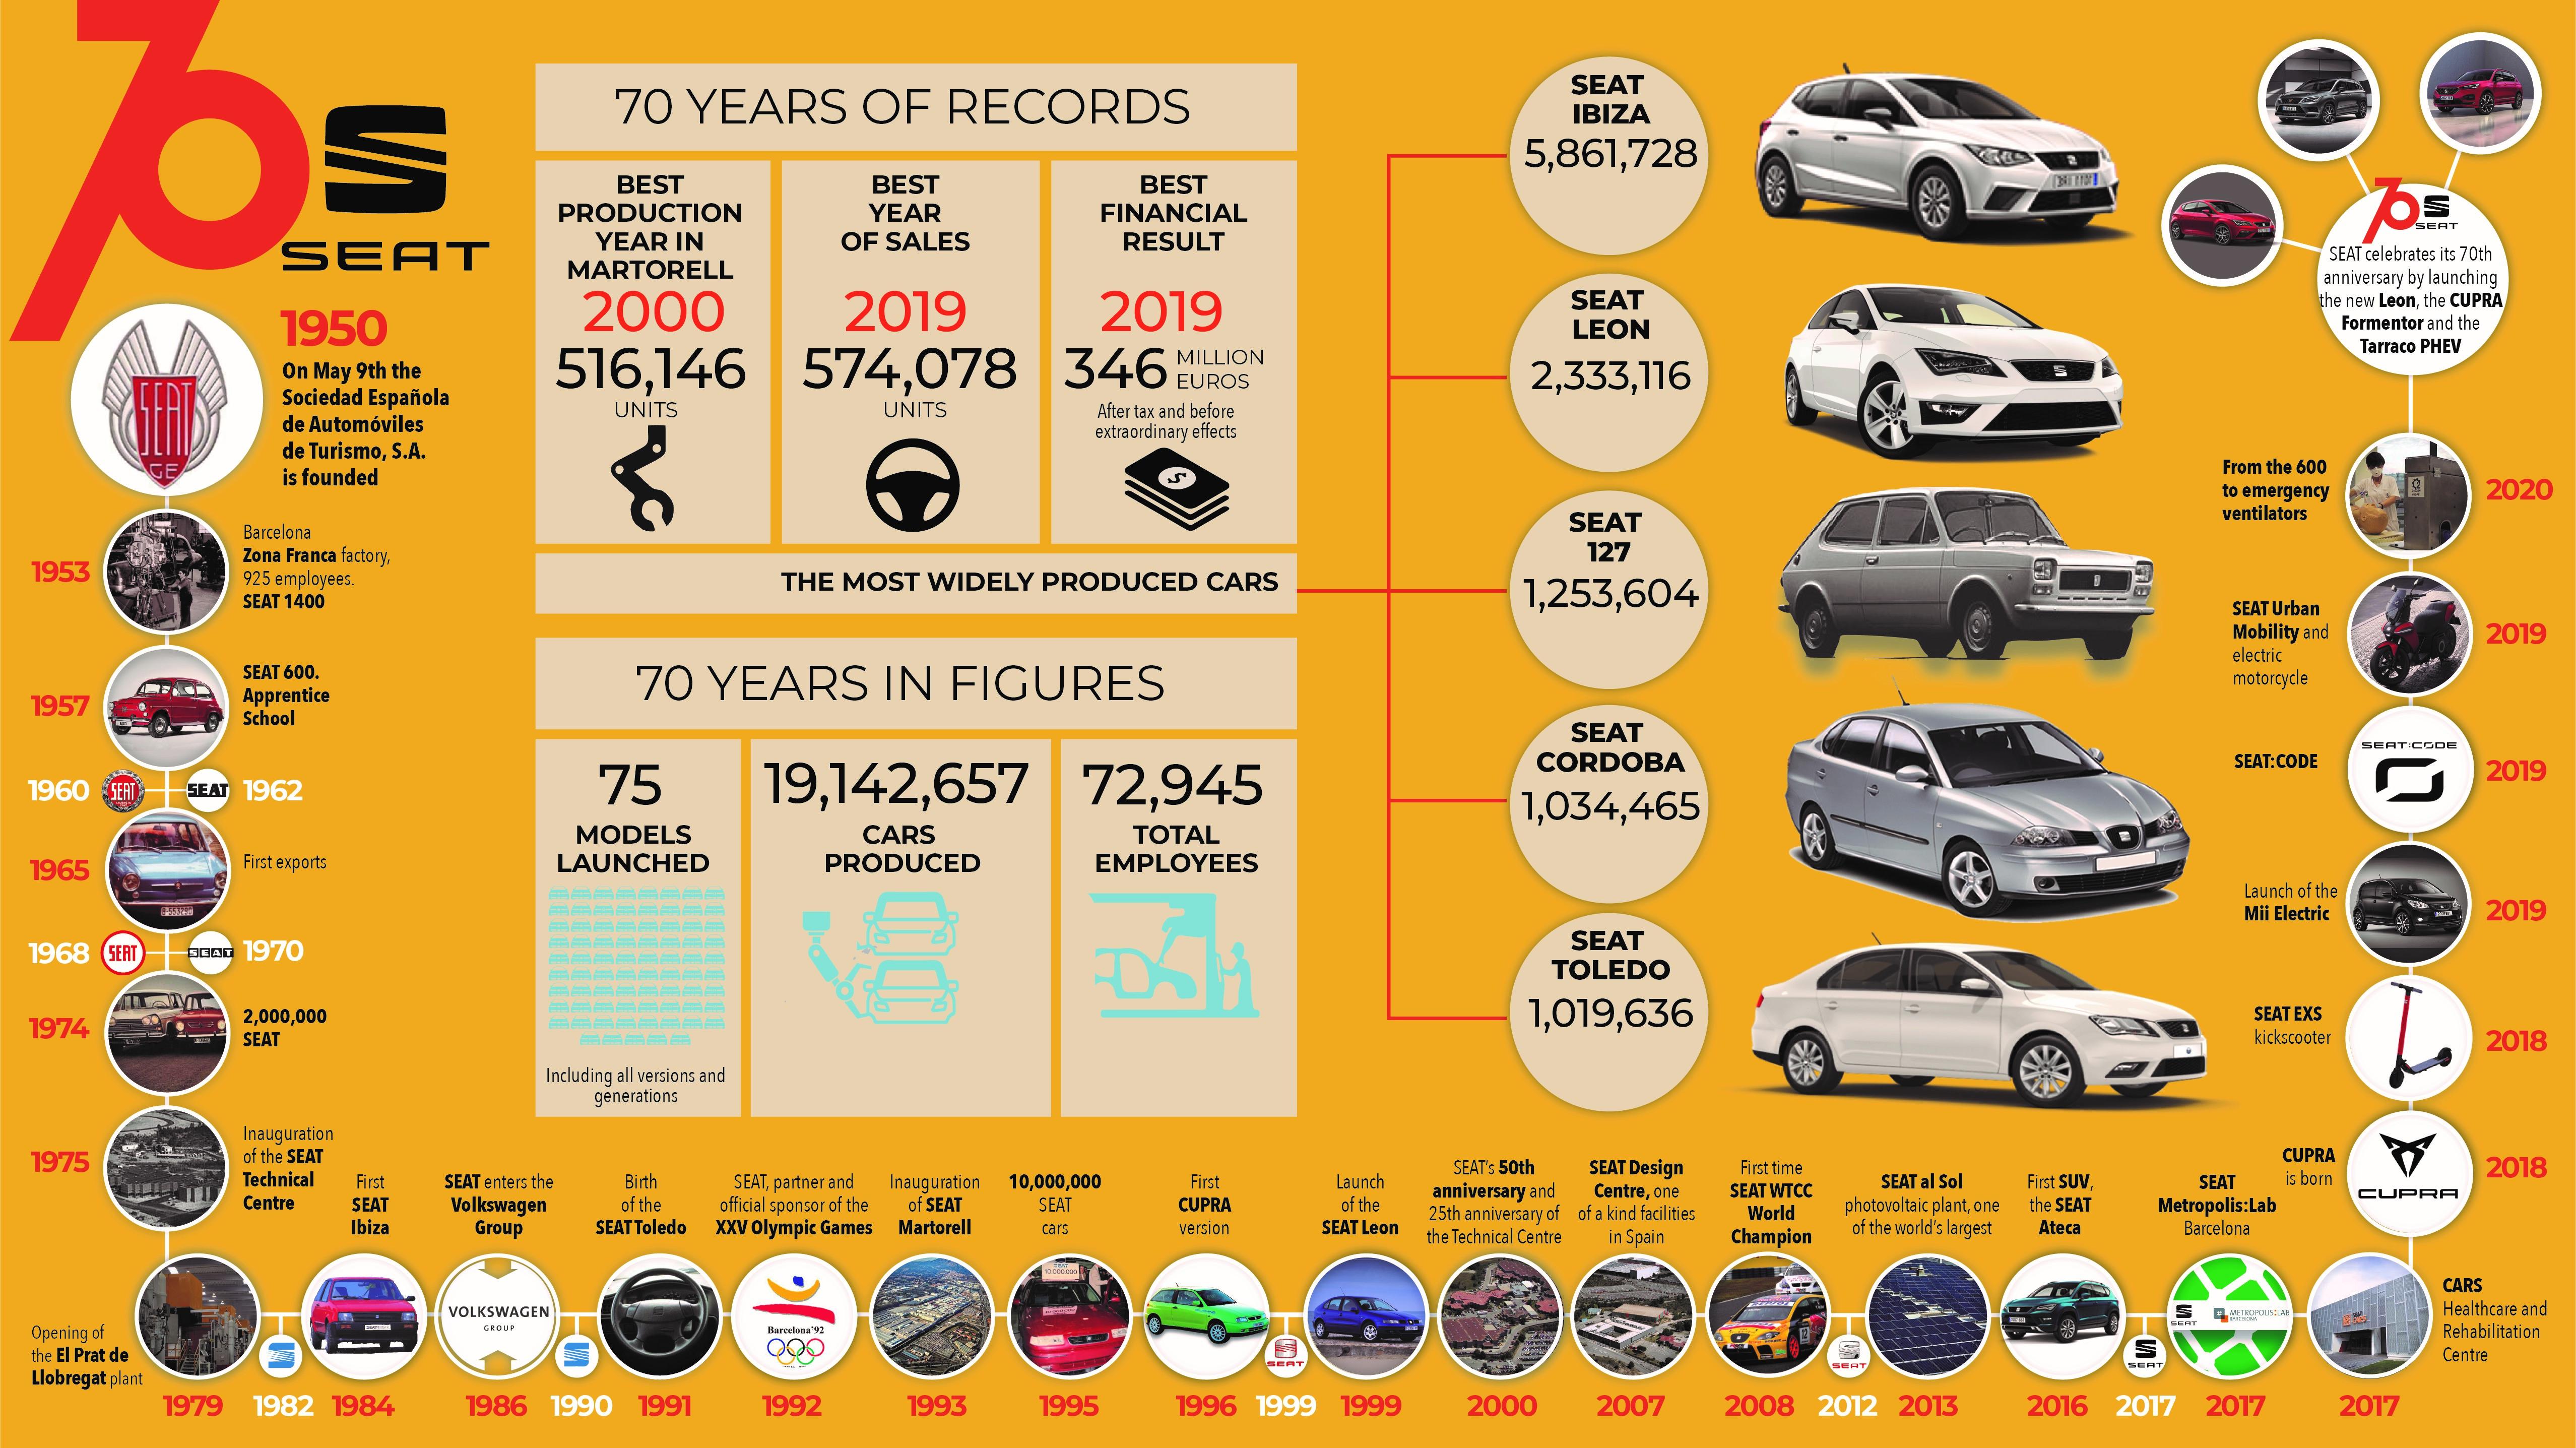 SEAT: Η αφίσα για τα 70 χρόνια παραγωγής αυτοκινήτων